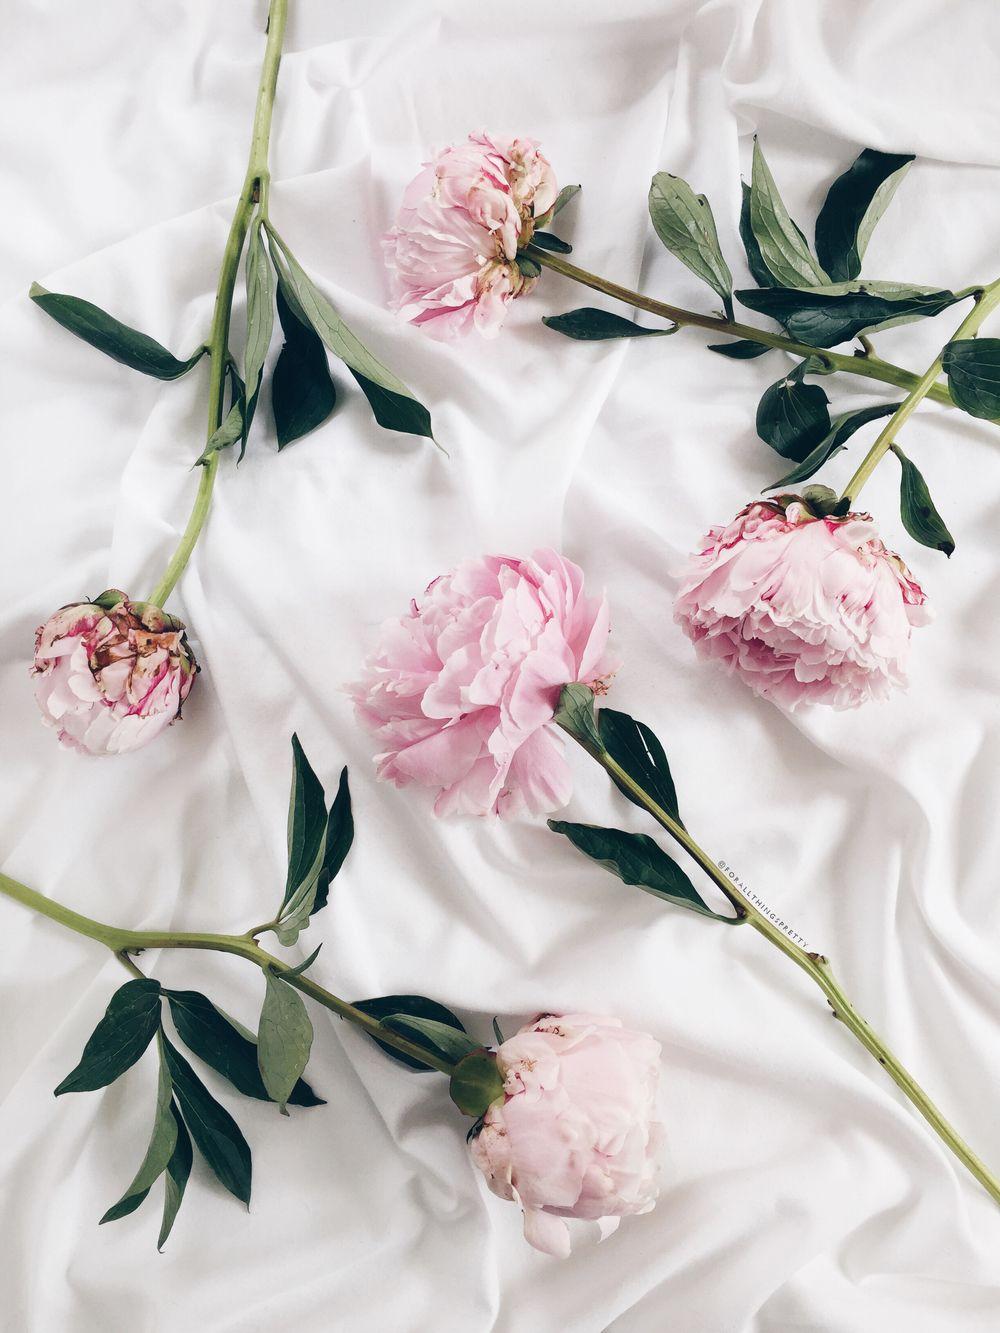 Fleursociety – Pinterest for Florists